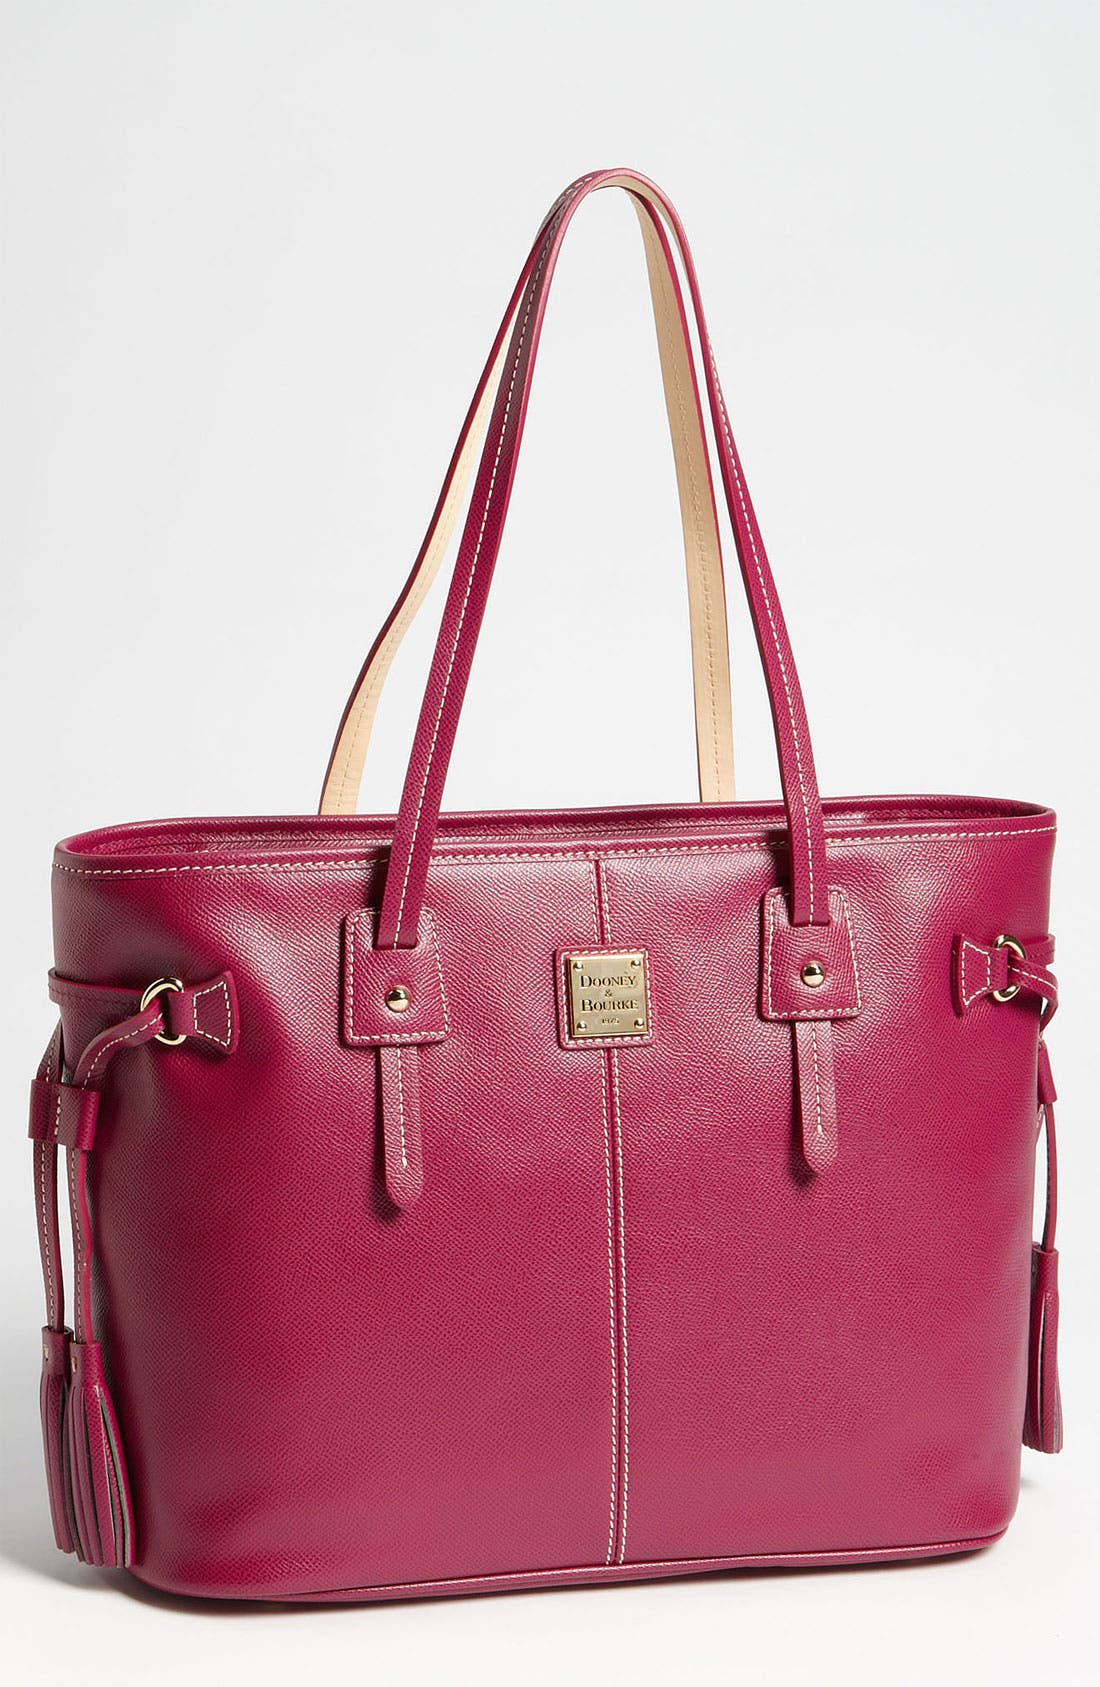 Main Image - Dooney & Bourke 'Davis Tassel' Shopper